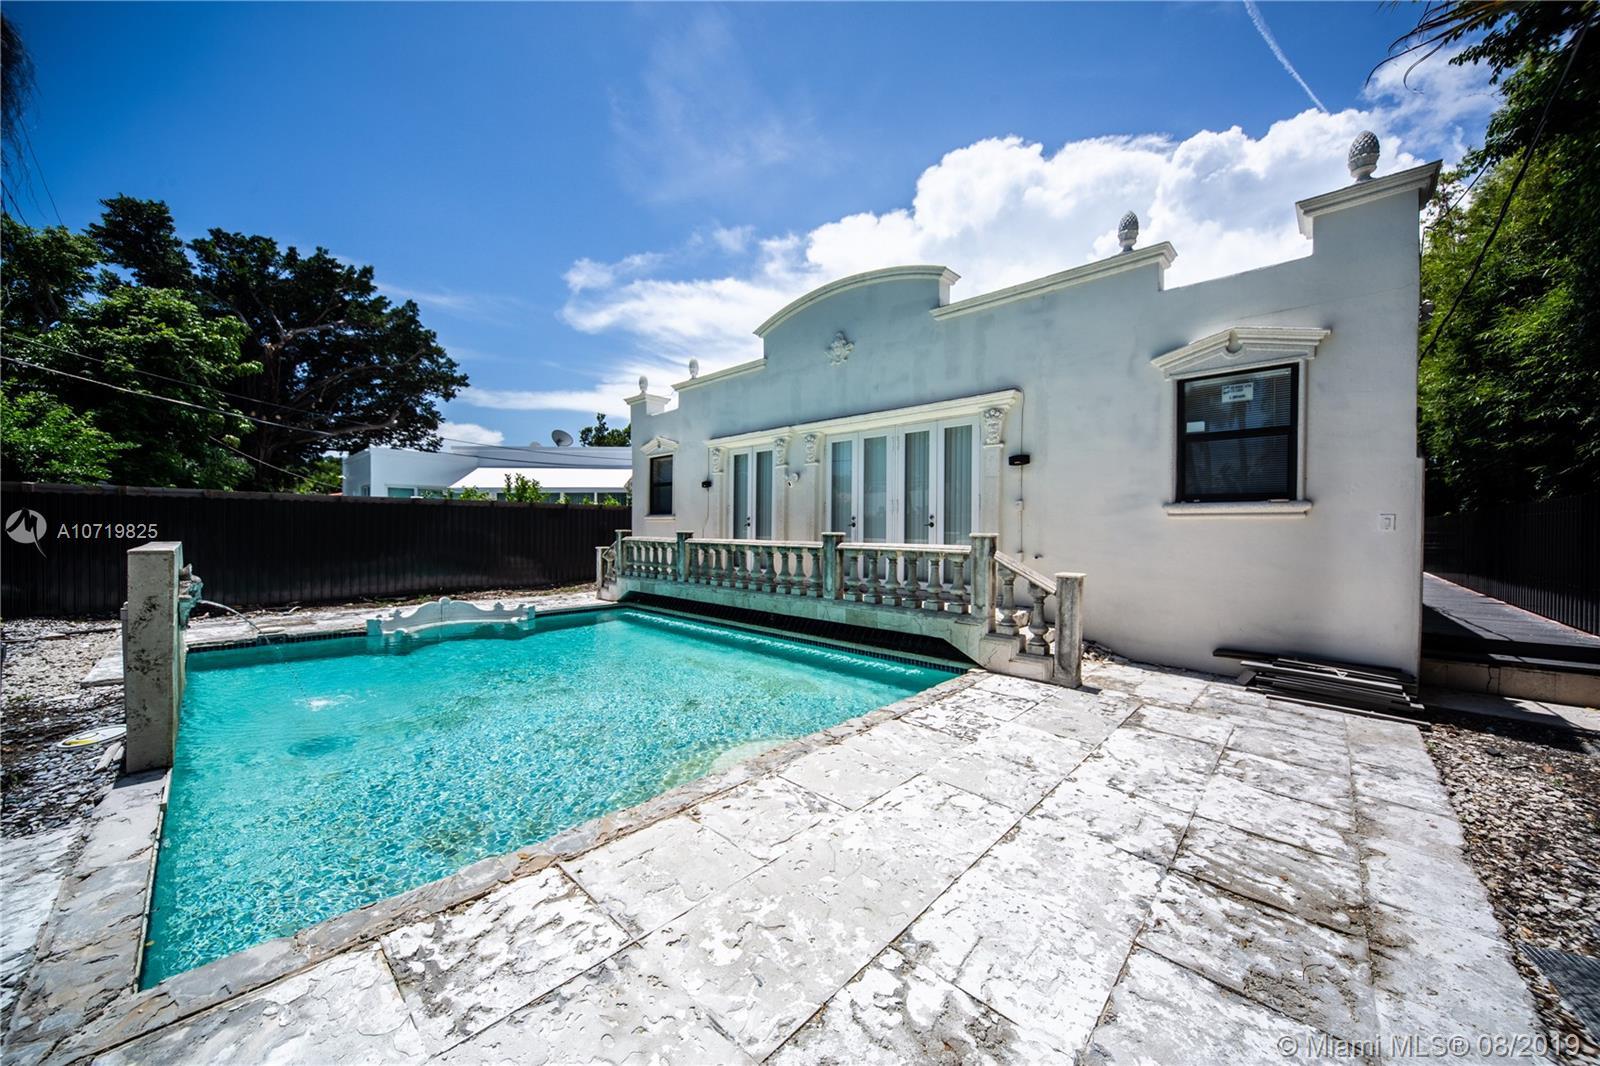 A vendre : Maison à Miami Beach